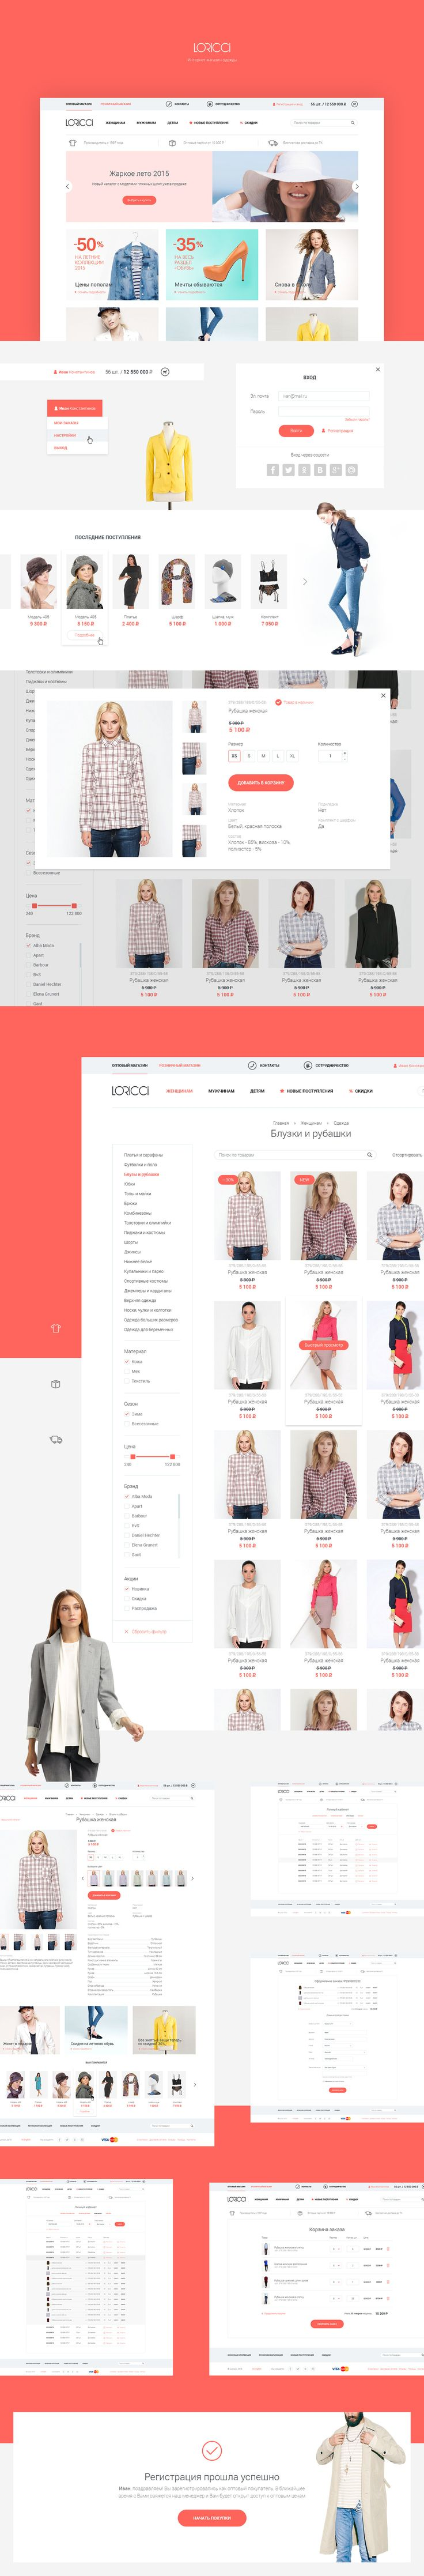 Clothing Ecommerce Site Design